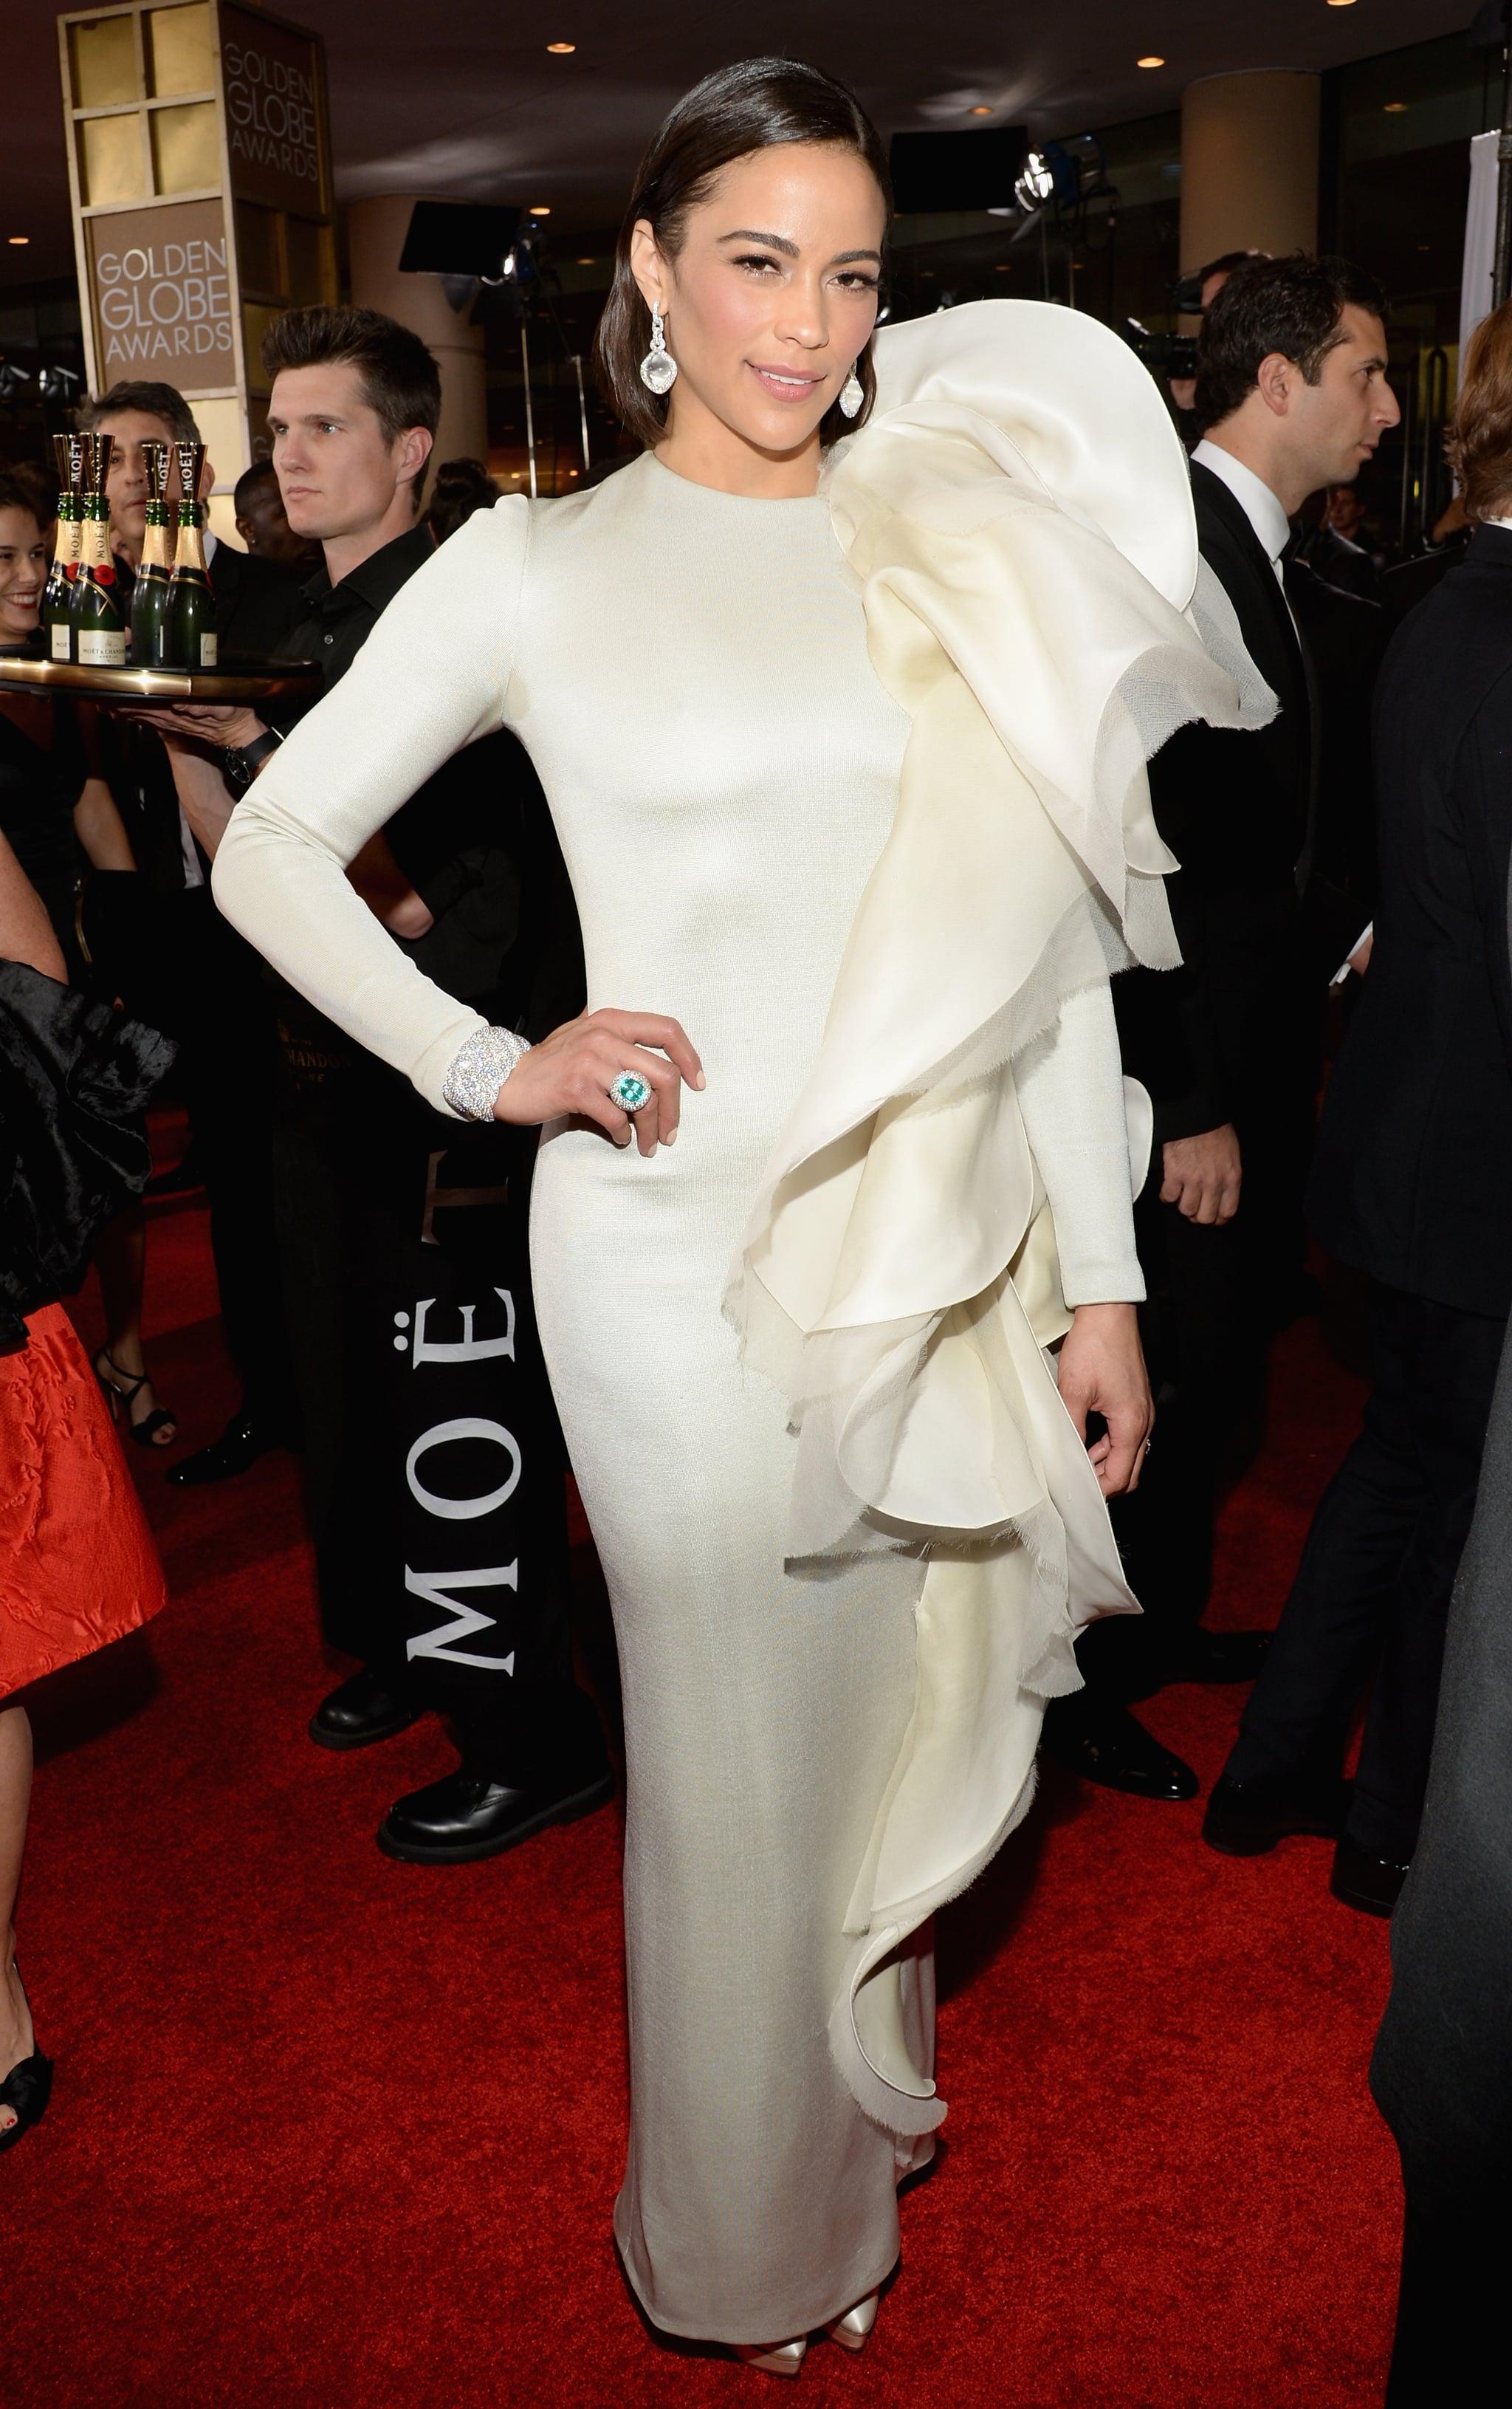 Paula Patton Dress On Golden Globes 2014 Red Carpet